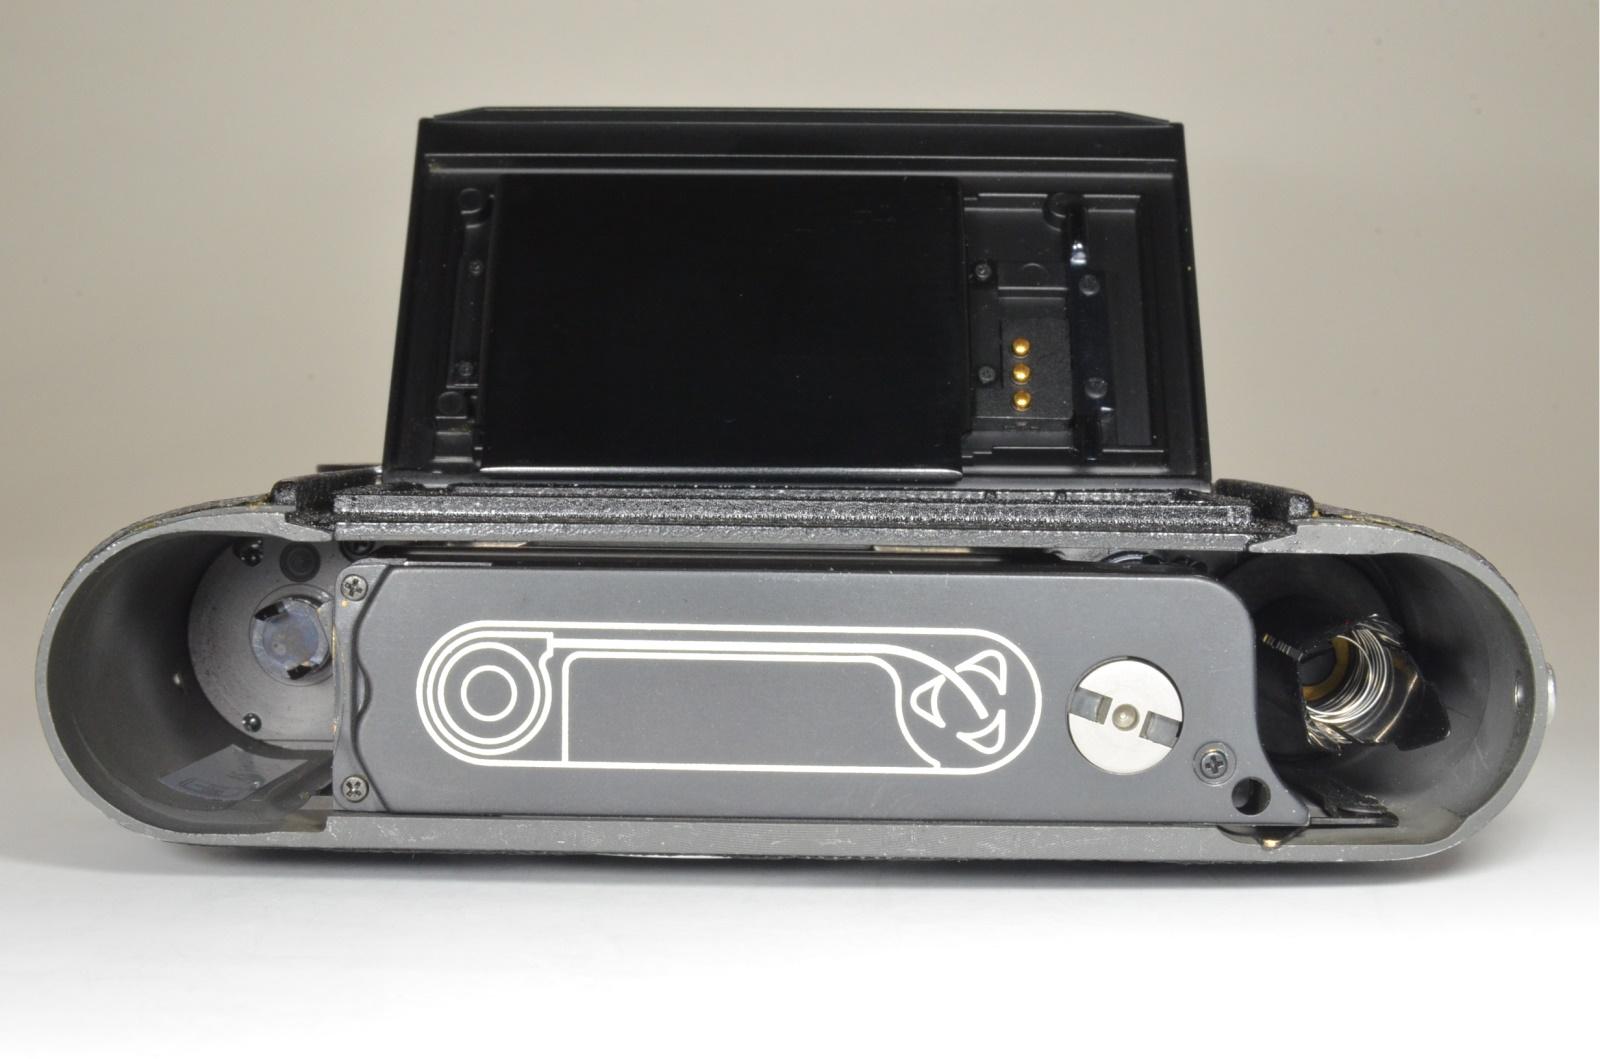 leica m6 0.72 black rangefinder no.1658937 year 1984 the camera cla'd recently